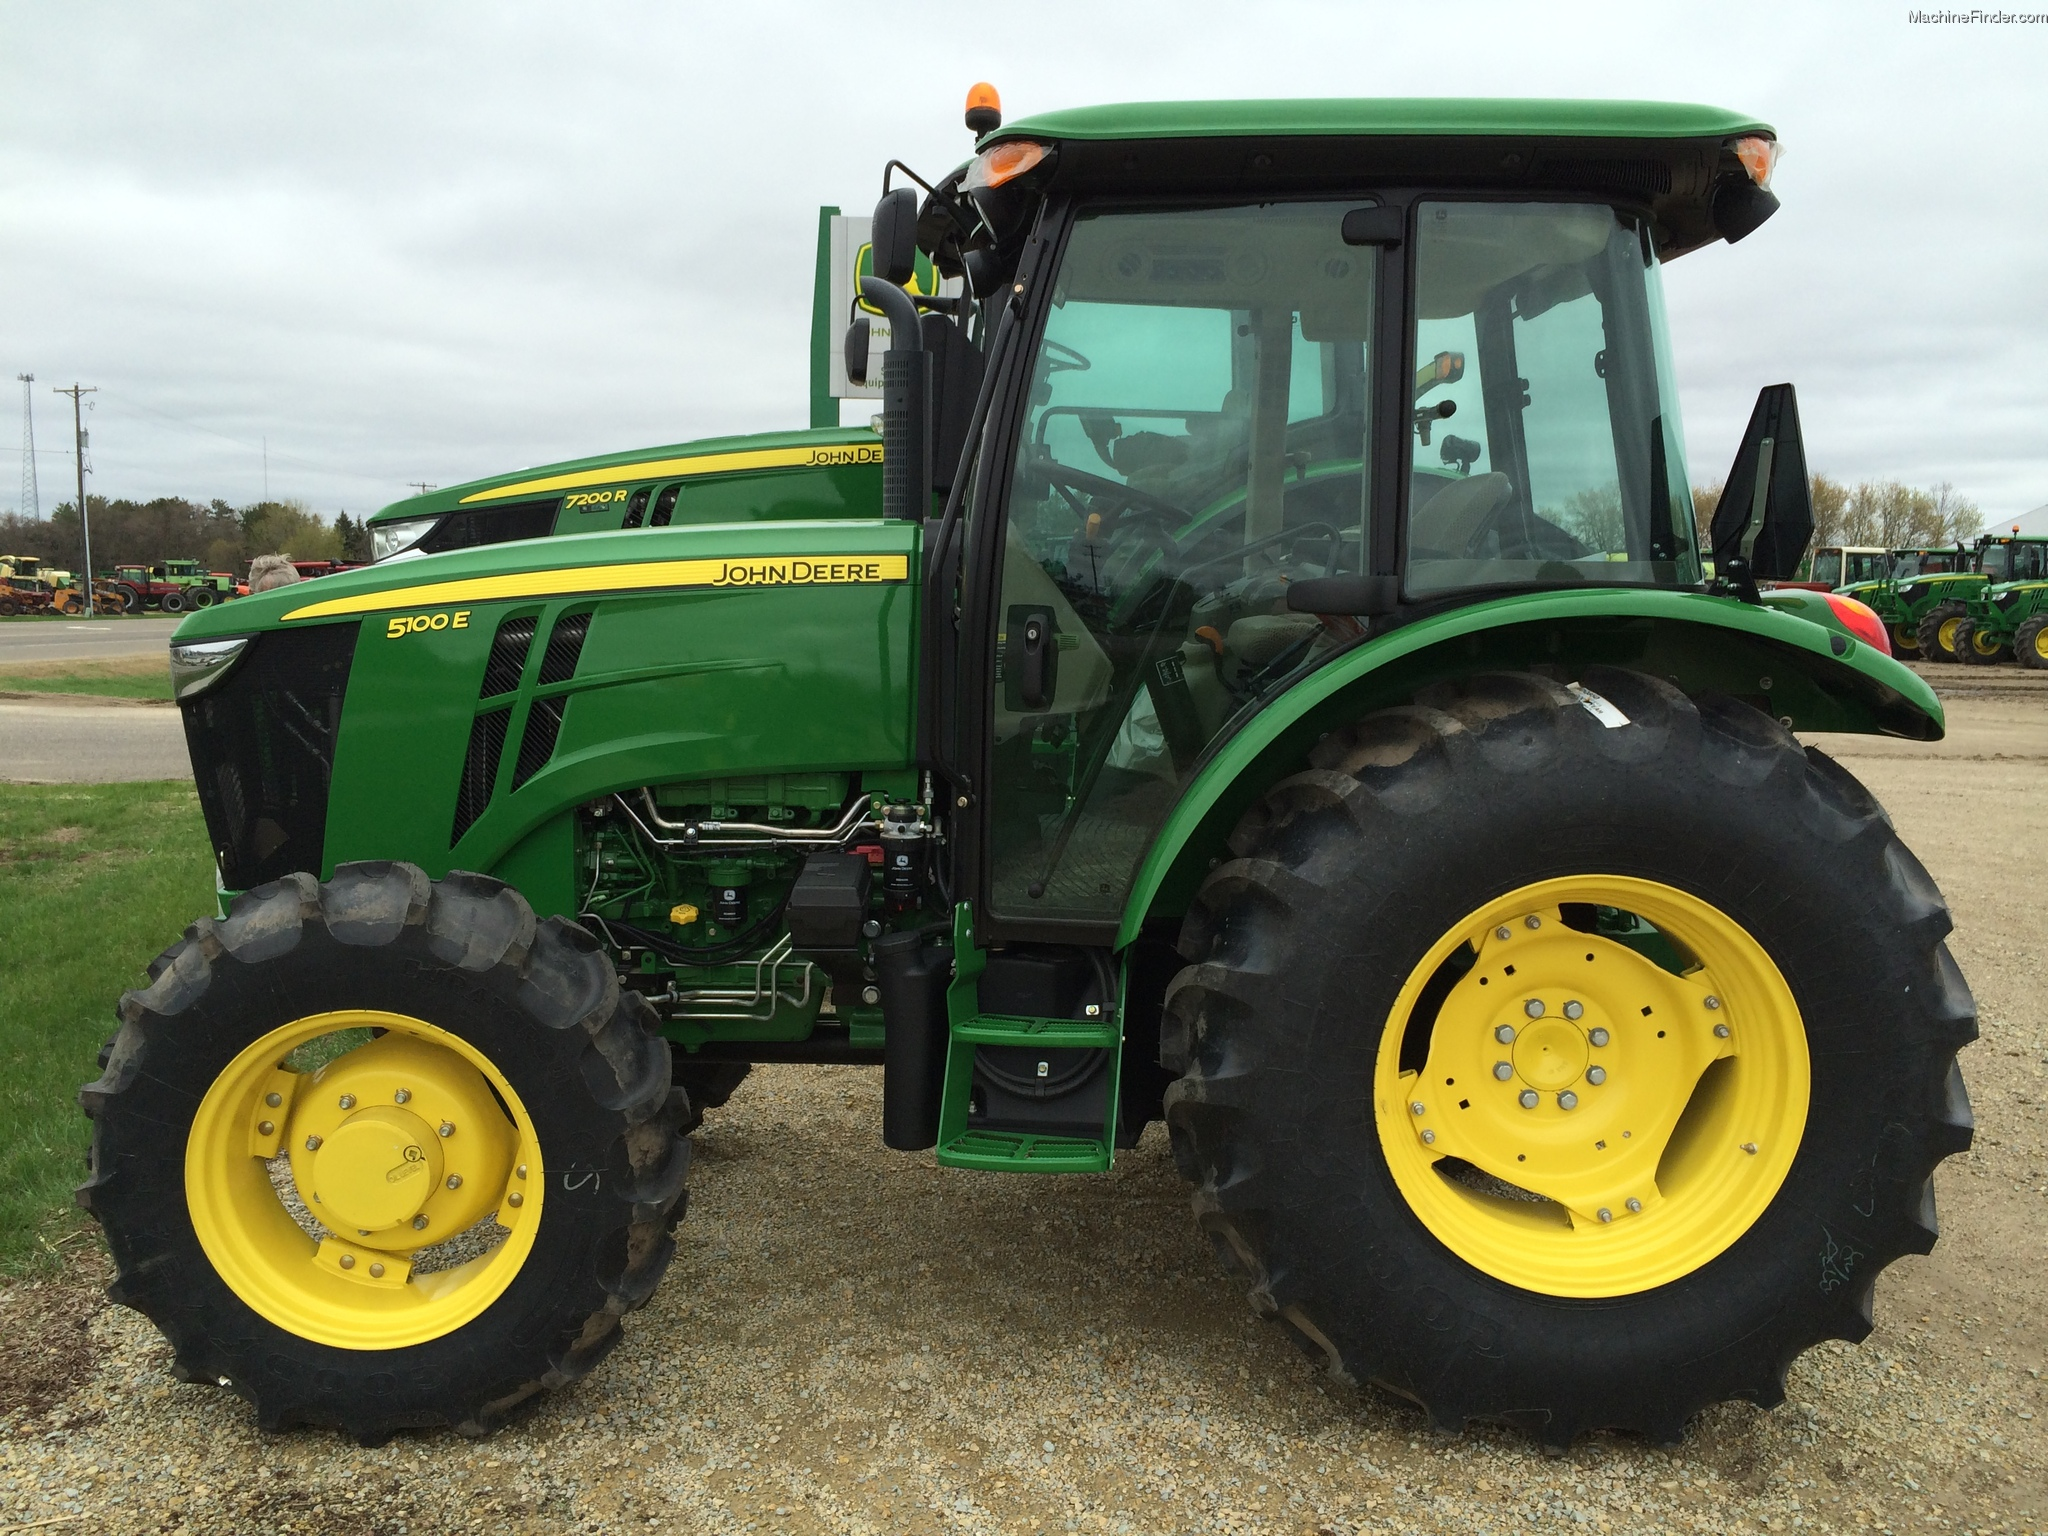 2013 John Deere 5100E Tractors - Utility (40-100hp) - John Deere ...